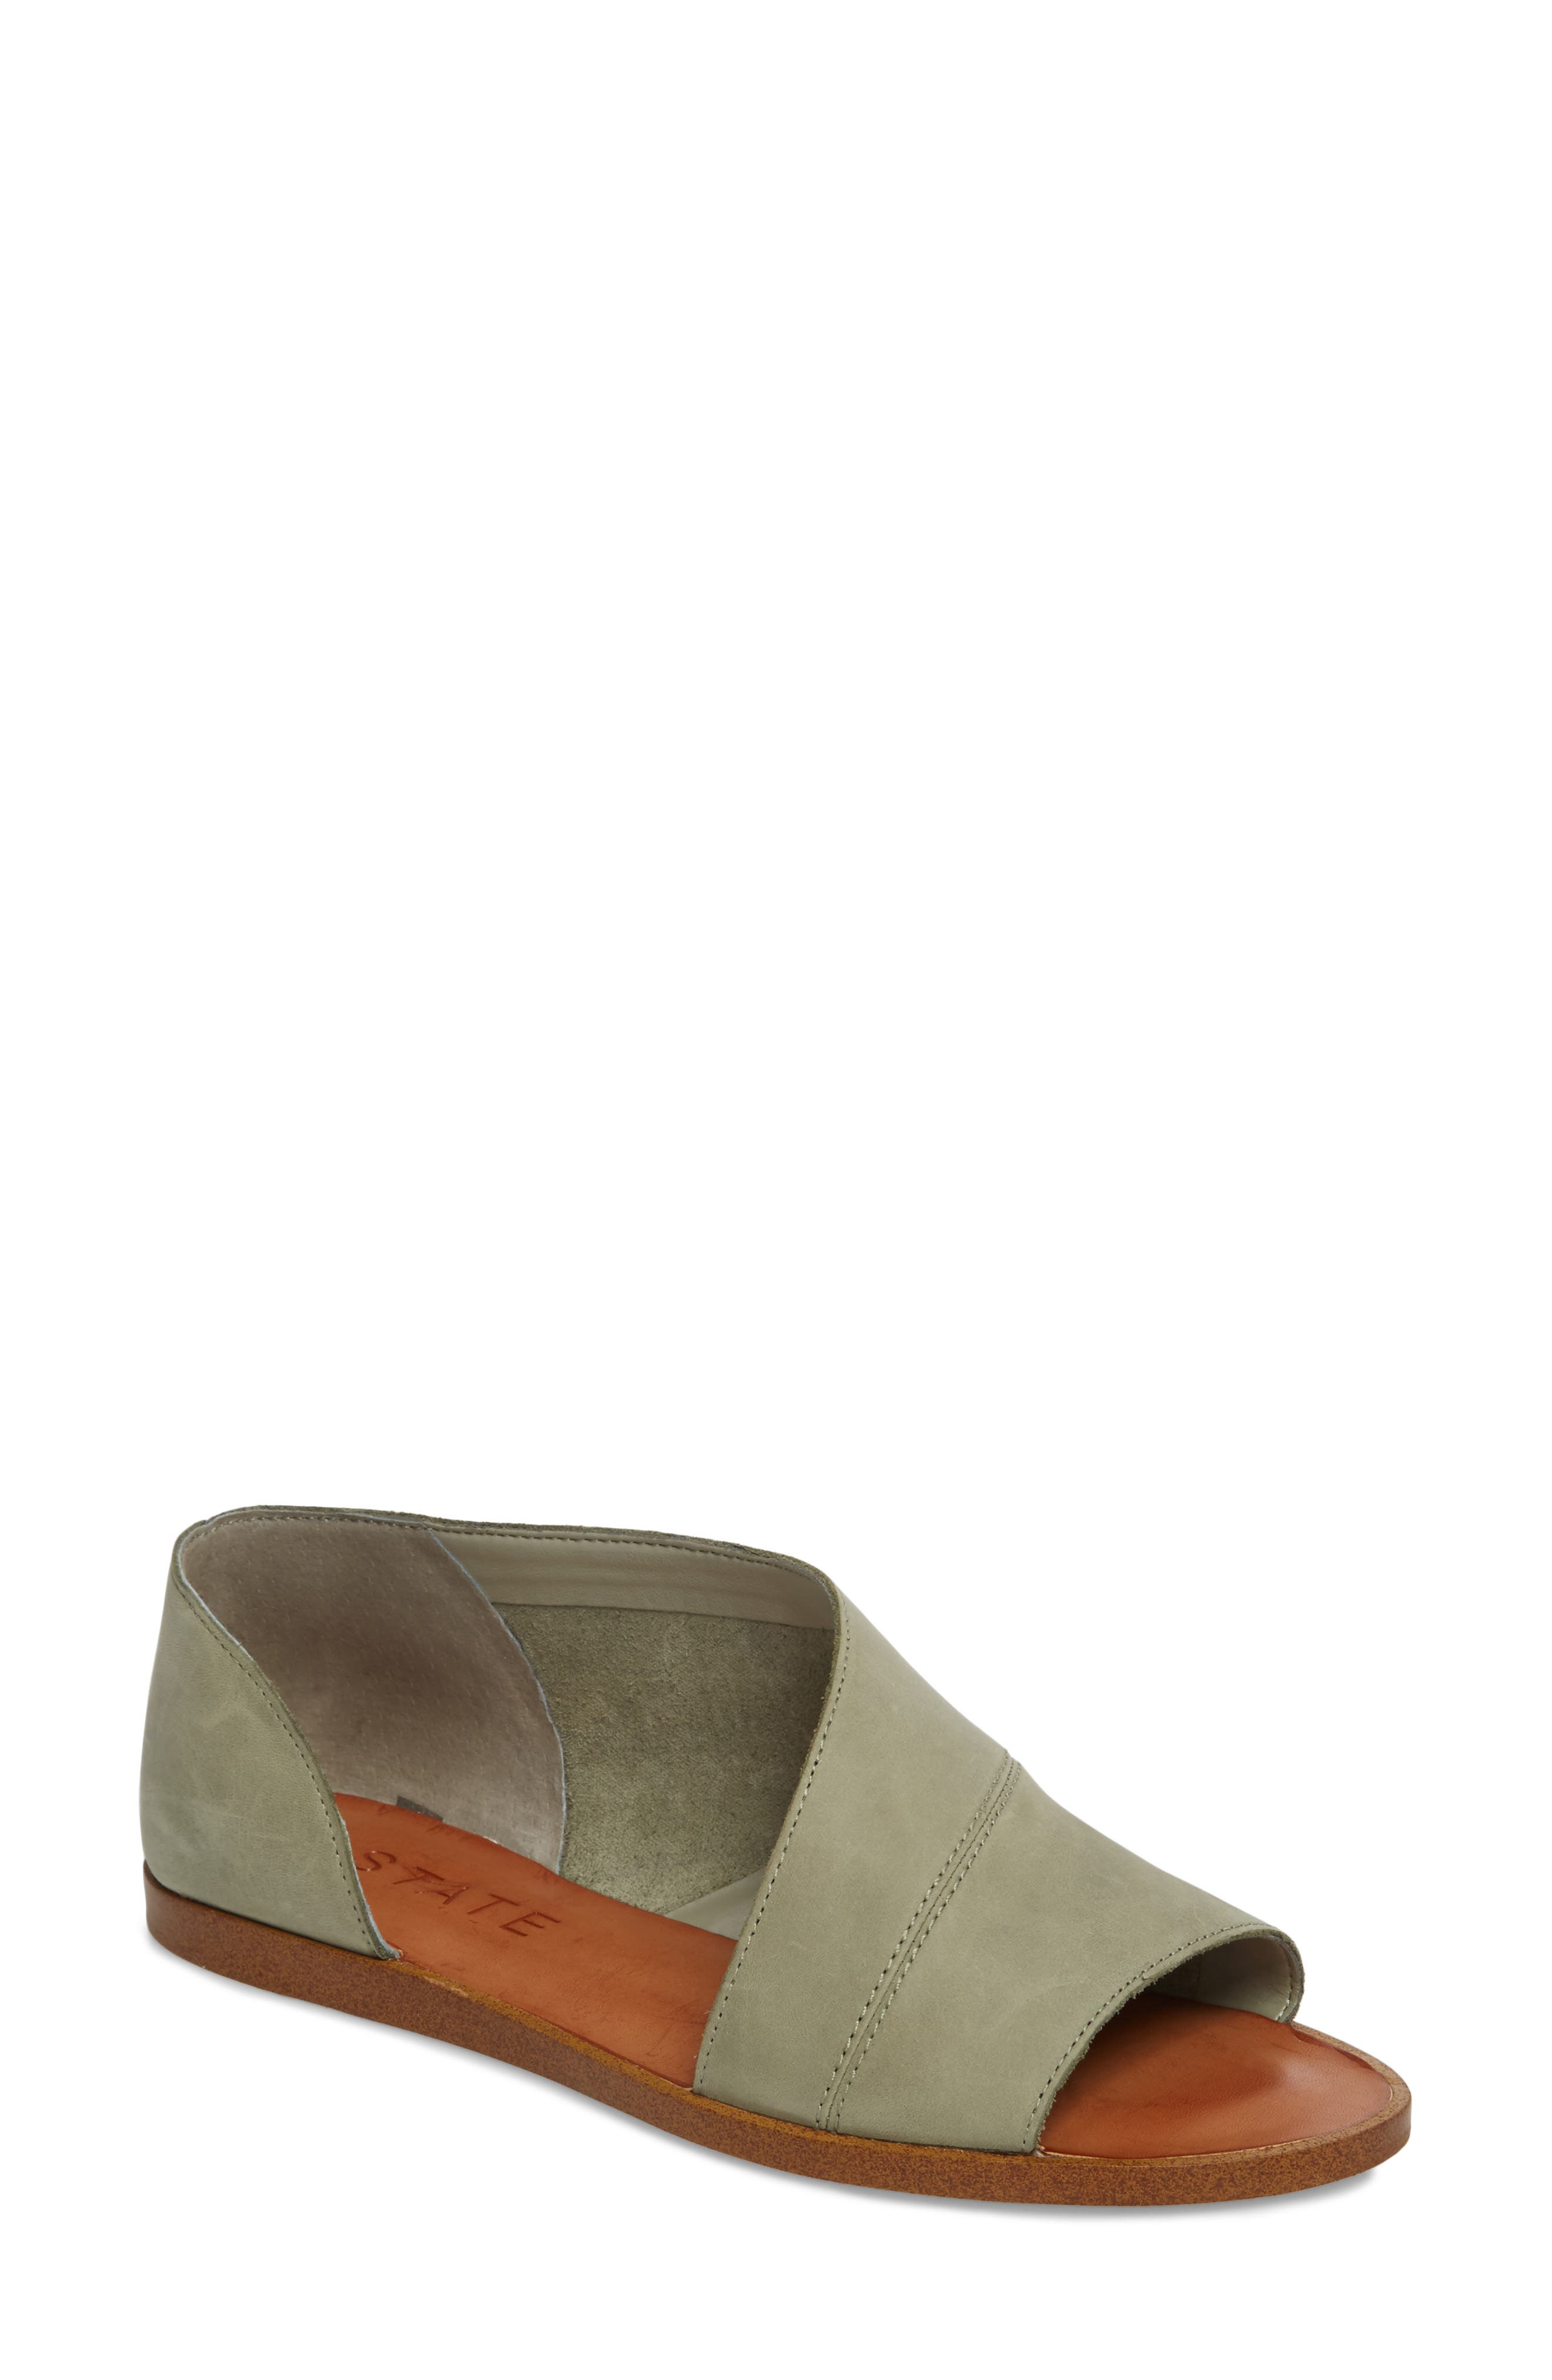 Celvin Sandal,                             Main thumbnail 1, color,                             Nettle Leather